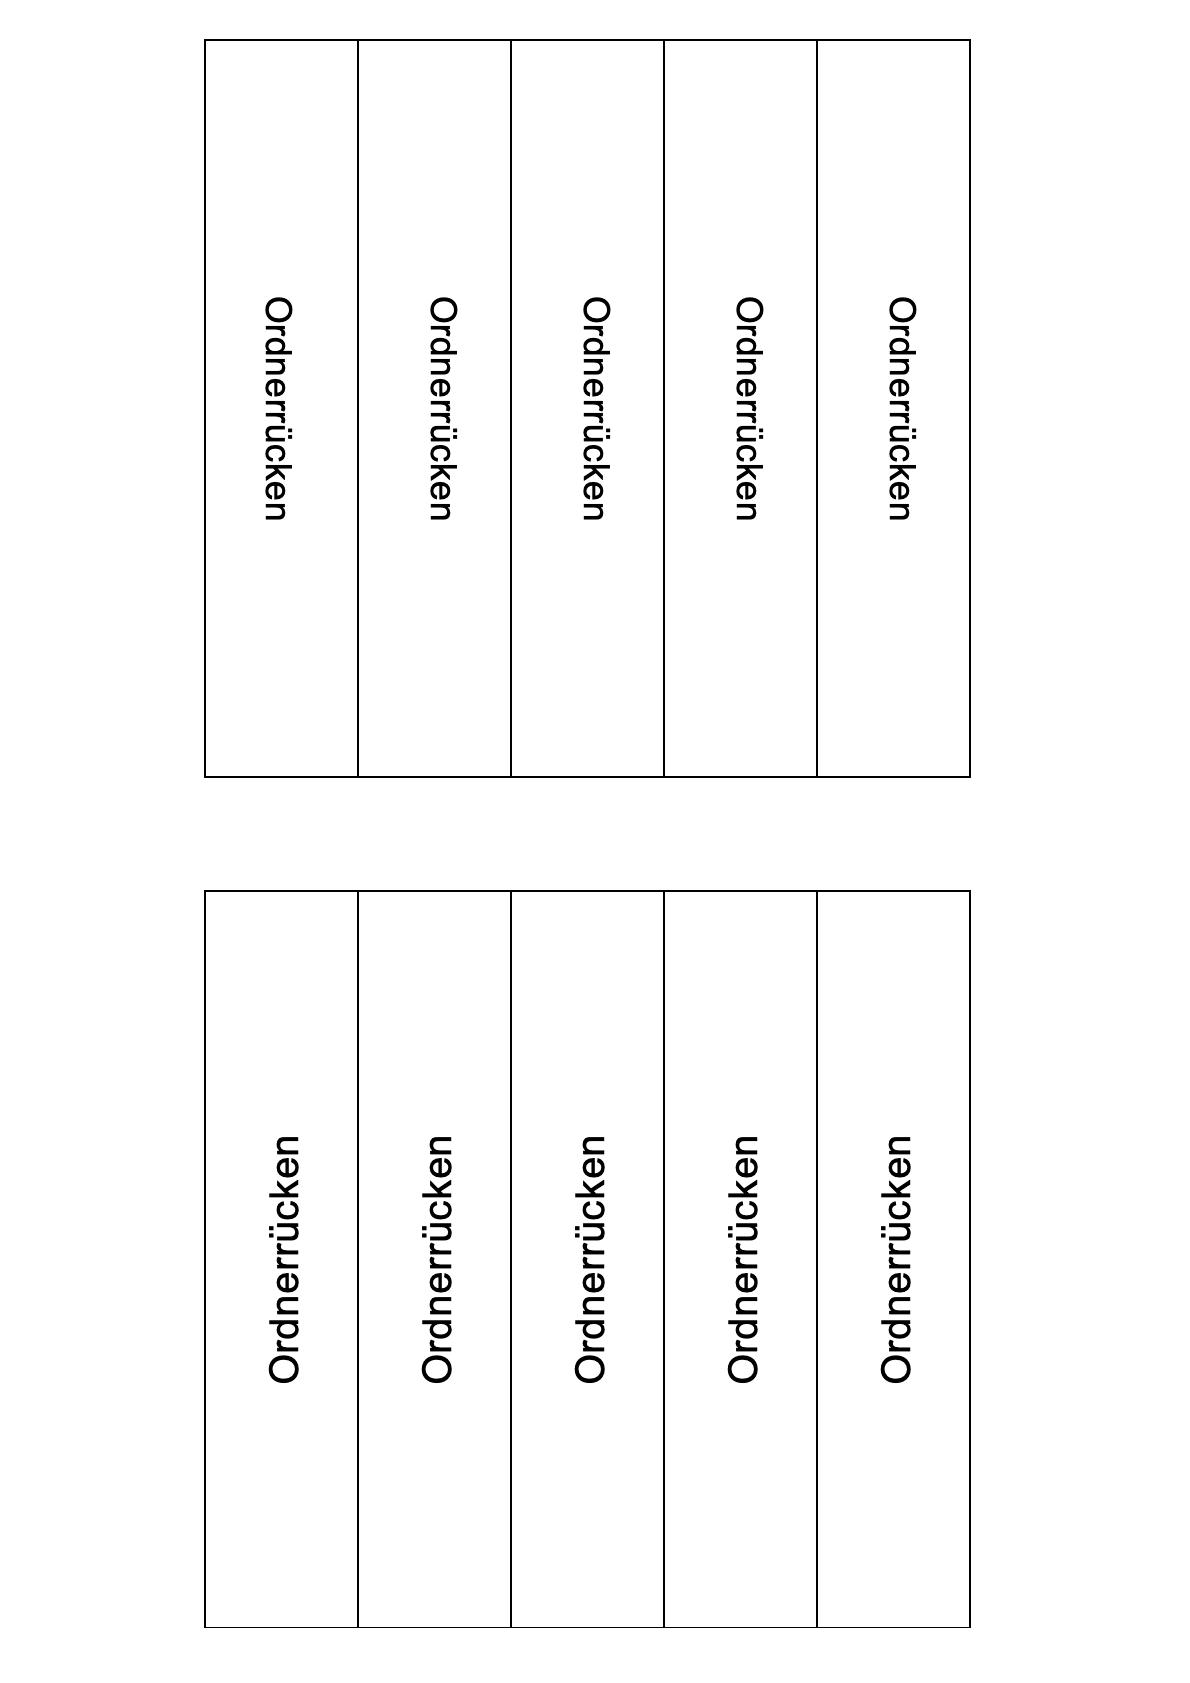 Ordnerrücken Vorlage Bundesordner 4 cm